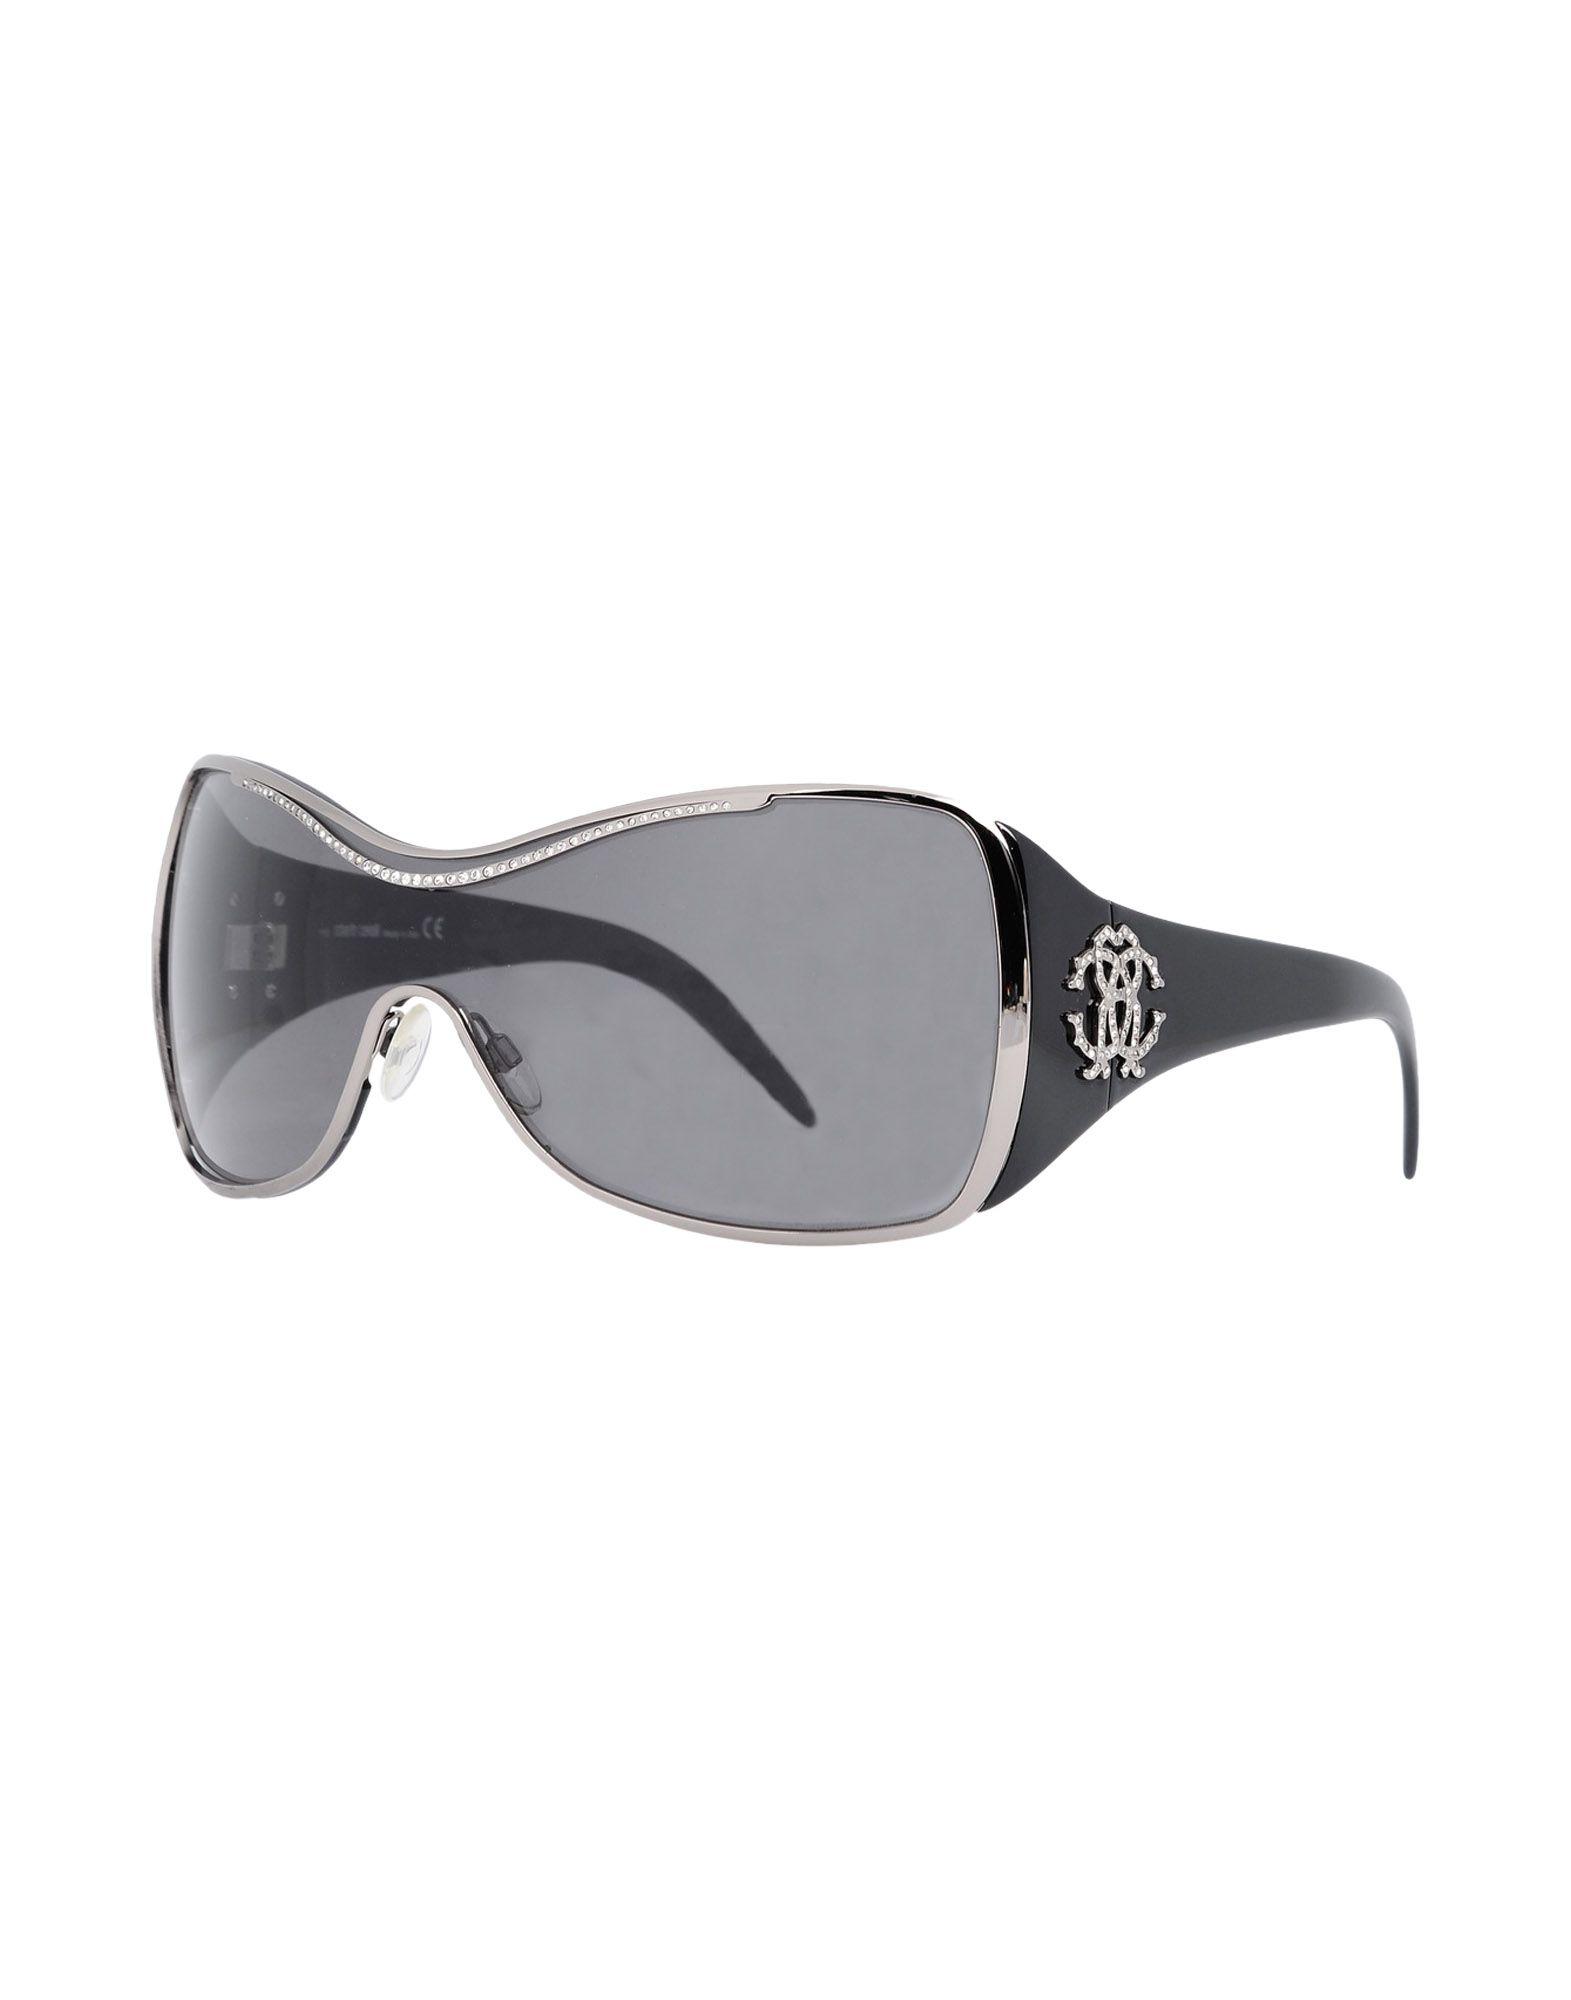 ROBERTO CAVALLI Солнечные очки солнцезащитные очки roberto cavalli солнцезащитные очки